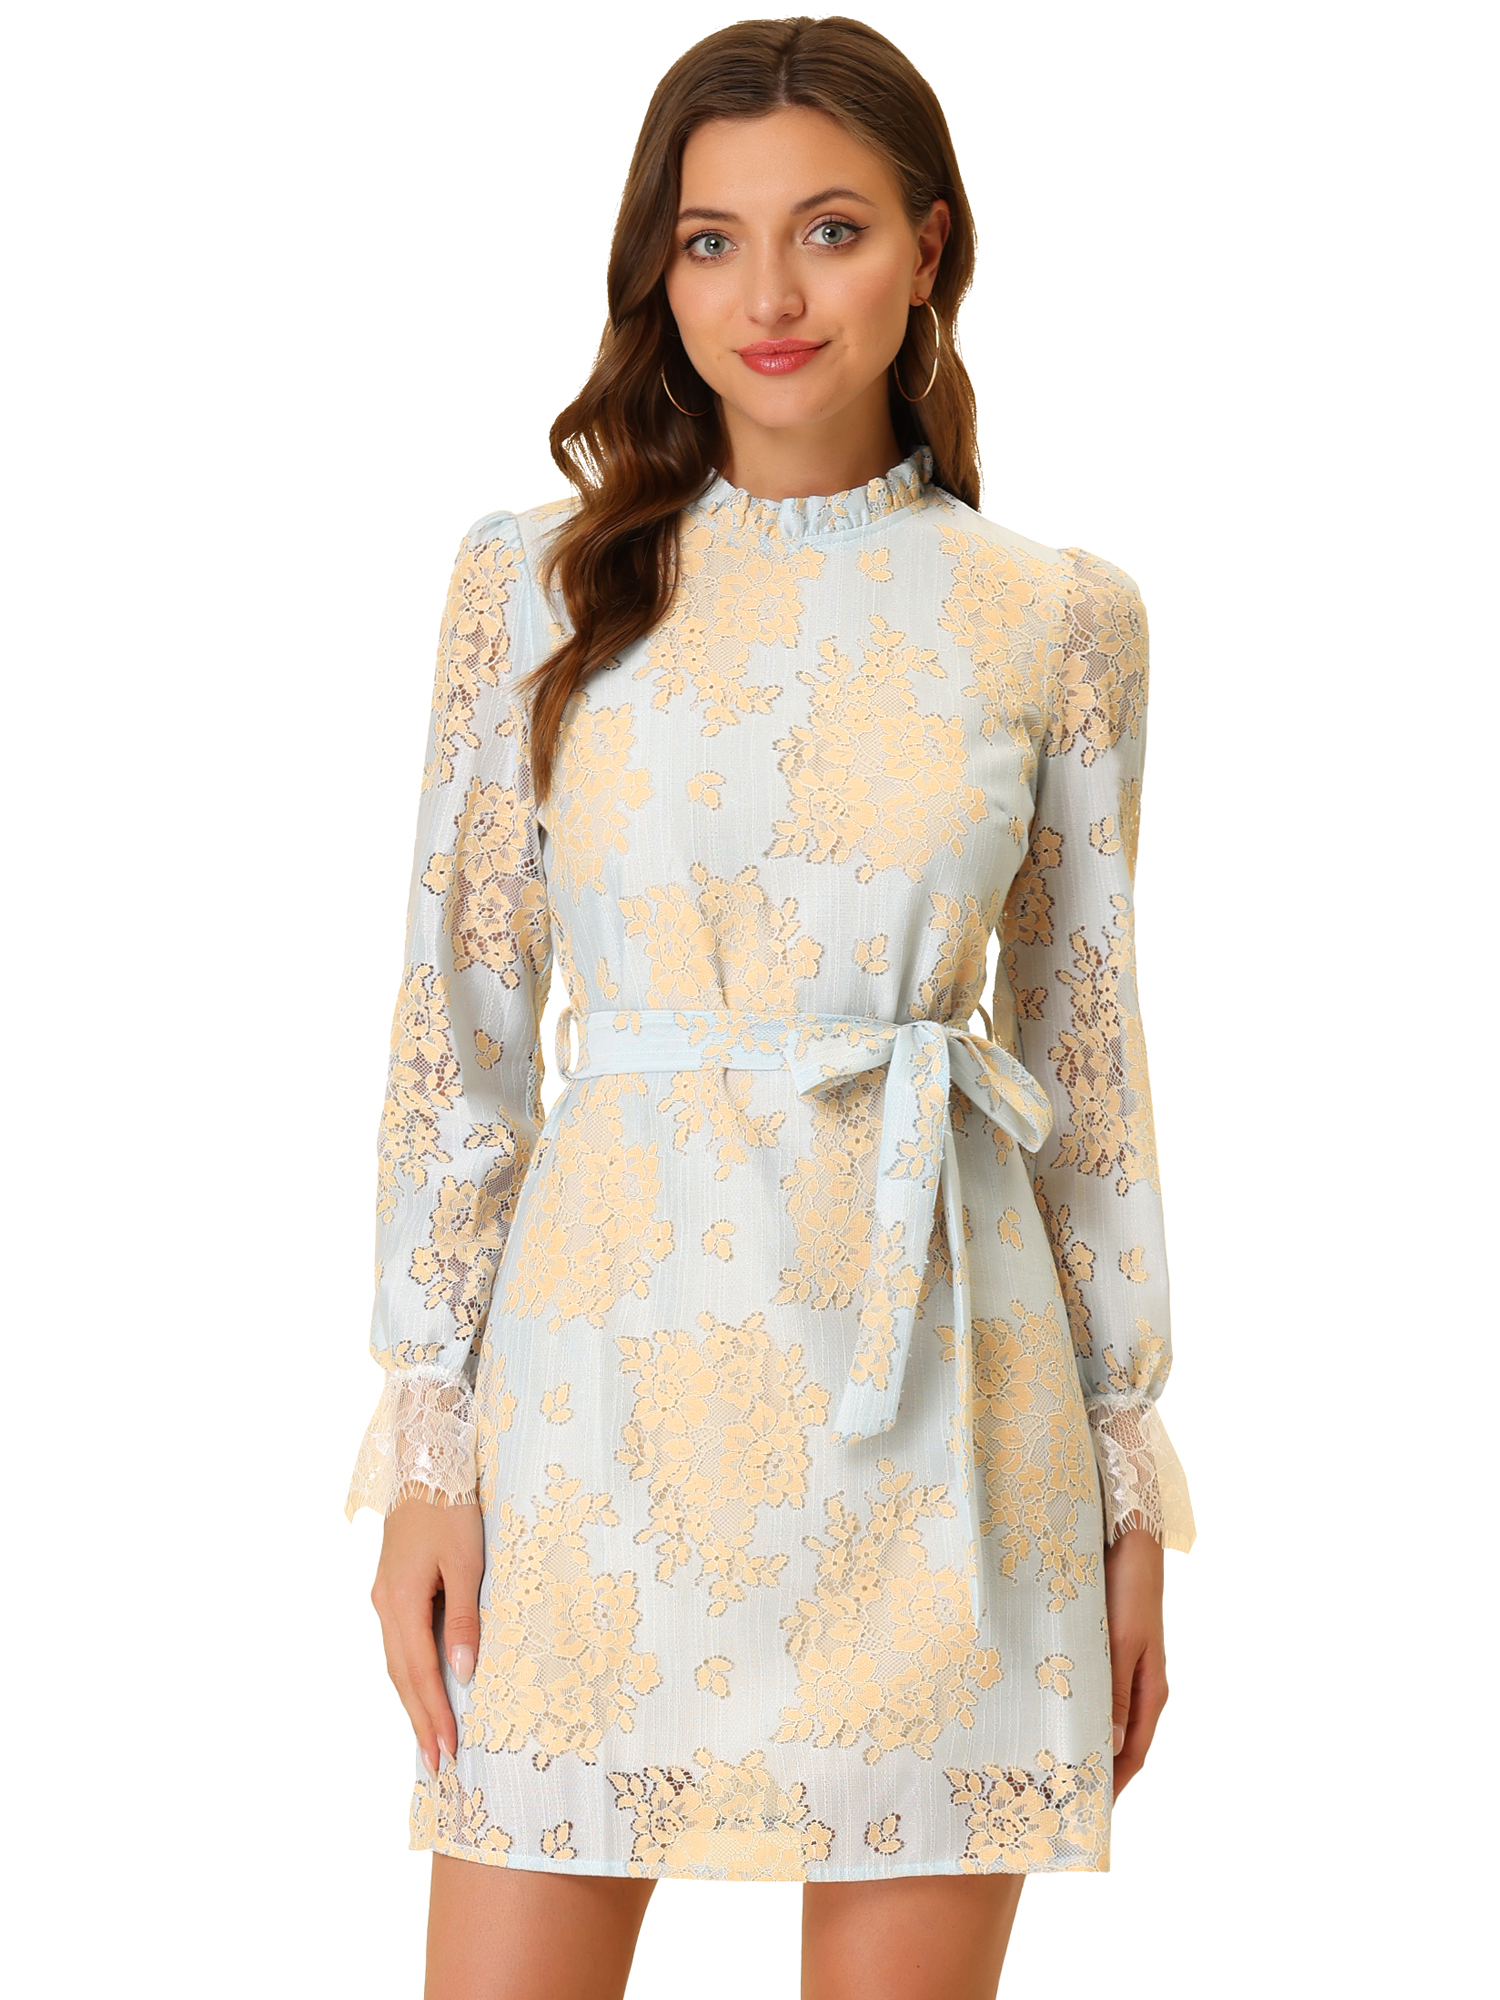 Allegra K Women's Ruffle Crew Neck Mini Floral Lace Dress Light Blue L